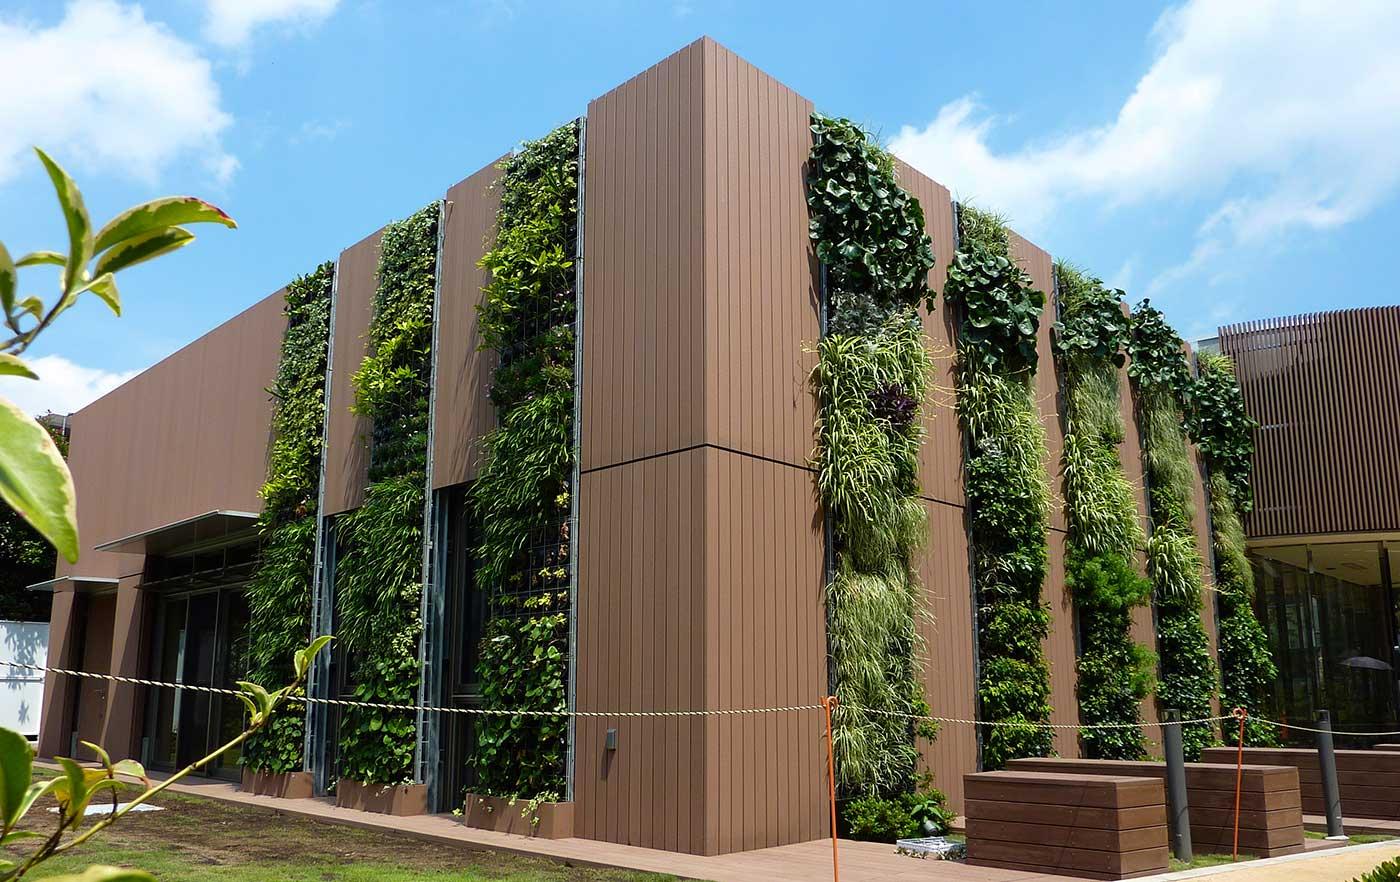 4-muros-verdes-japon